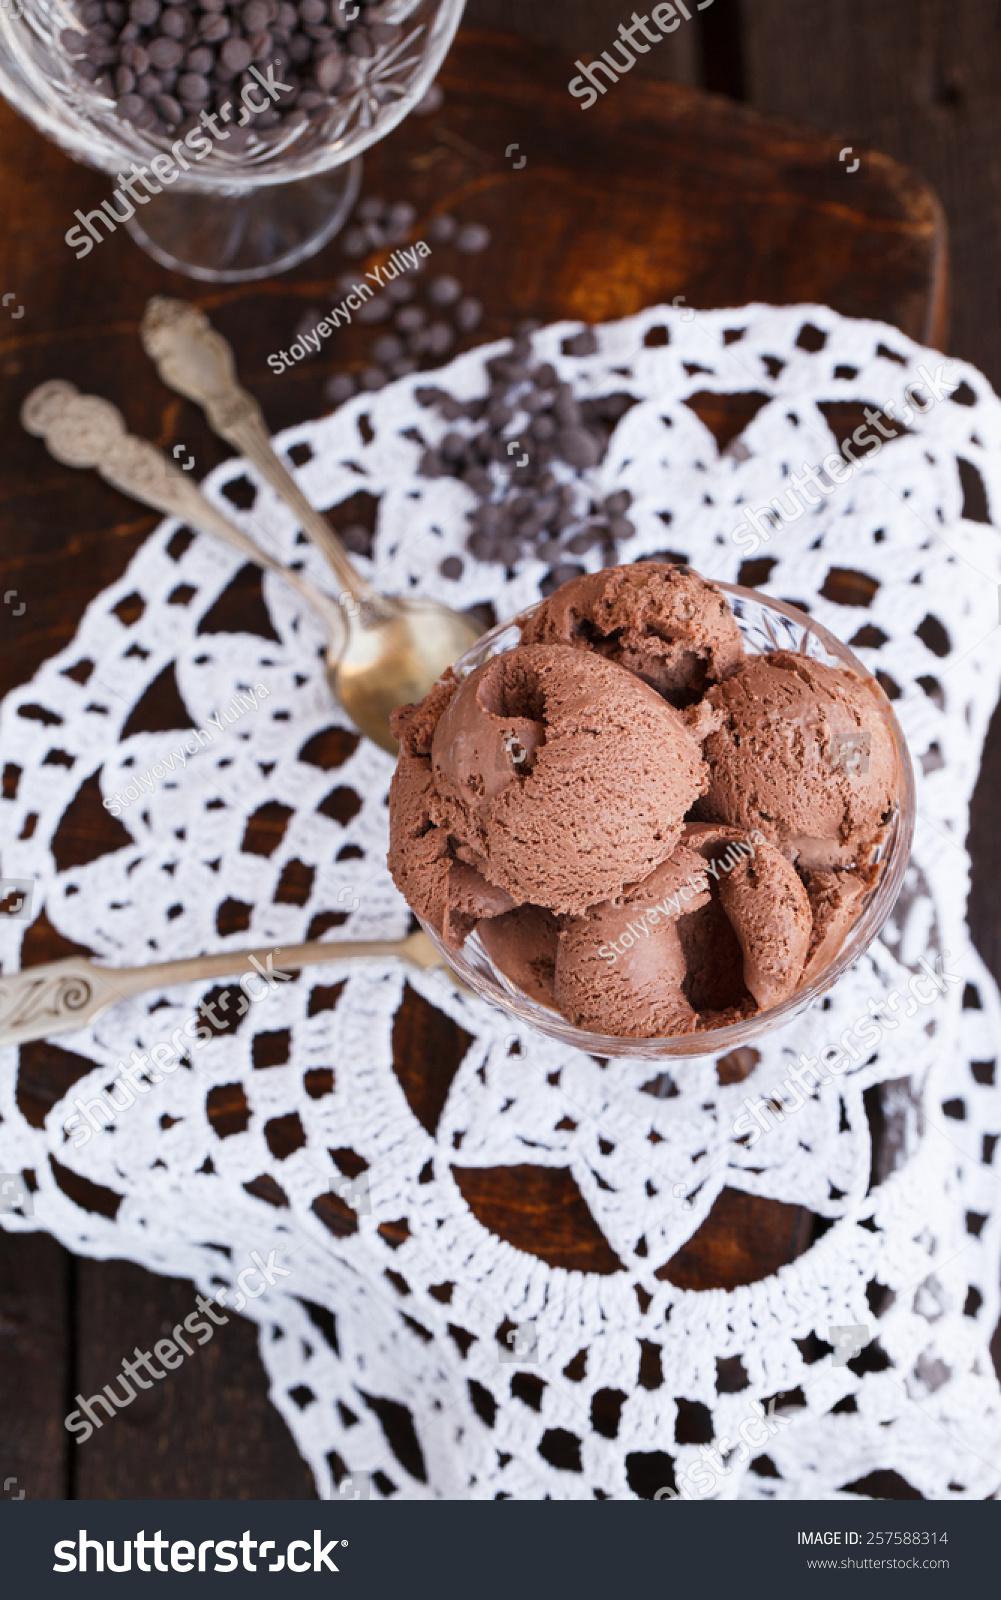 Ice cream bowls online dating 6